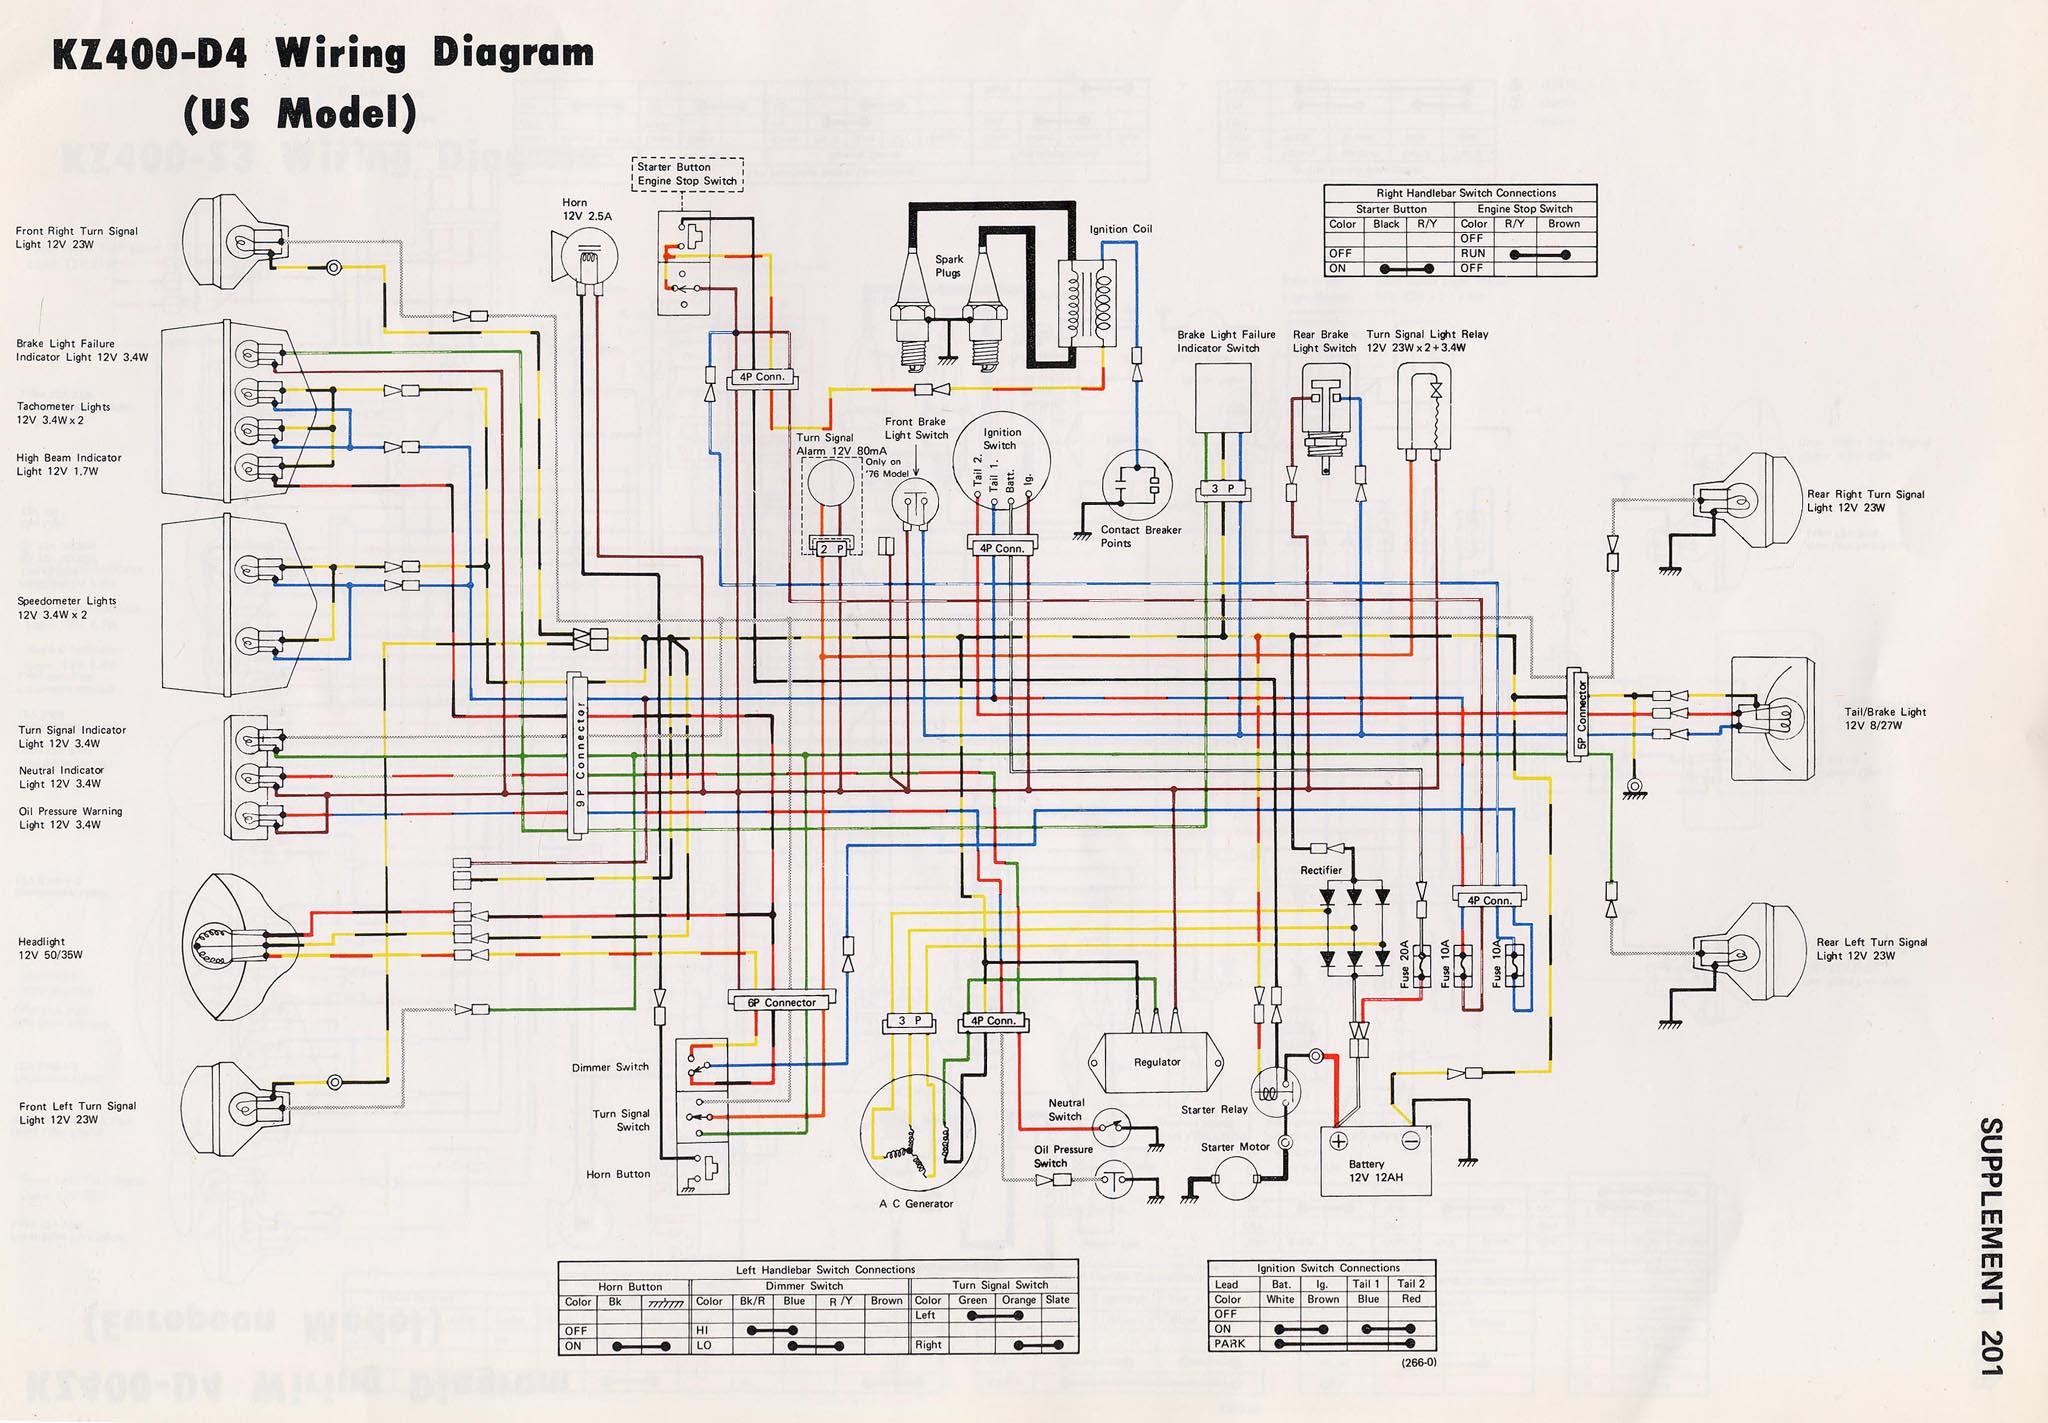 bobber kz650 wiring diagram